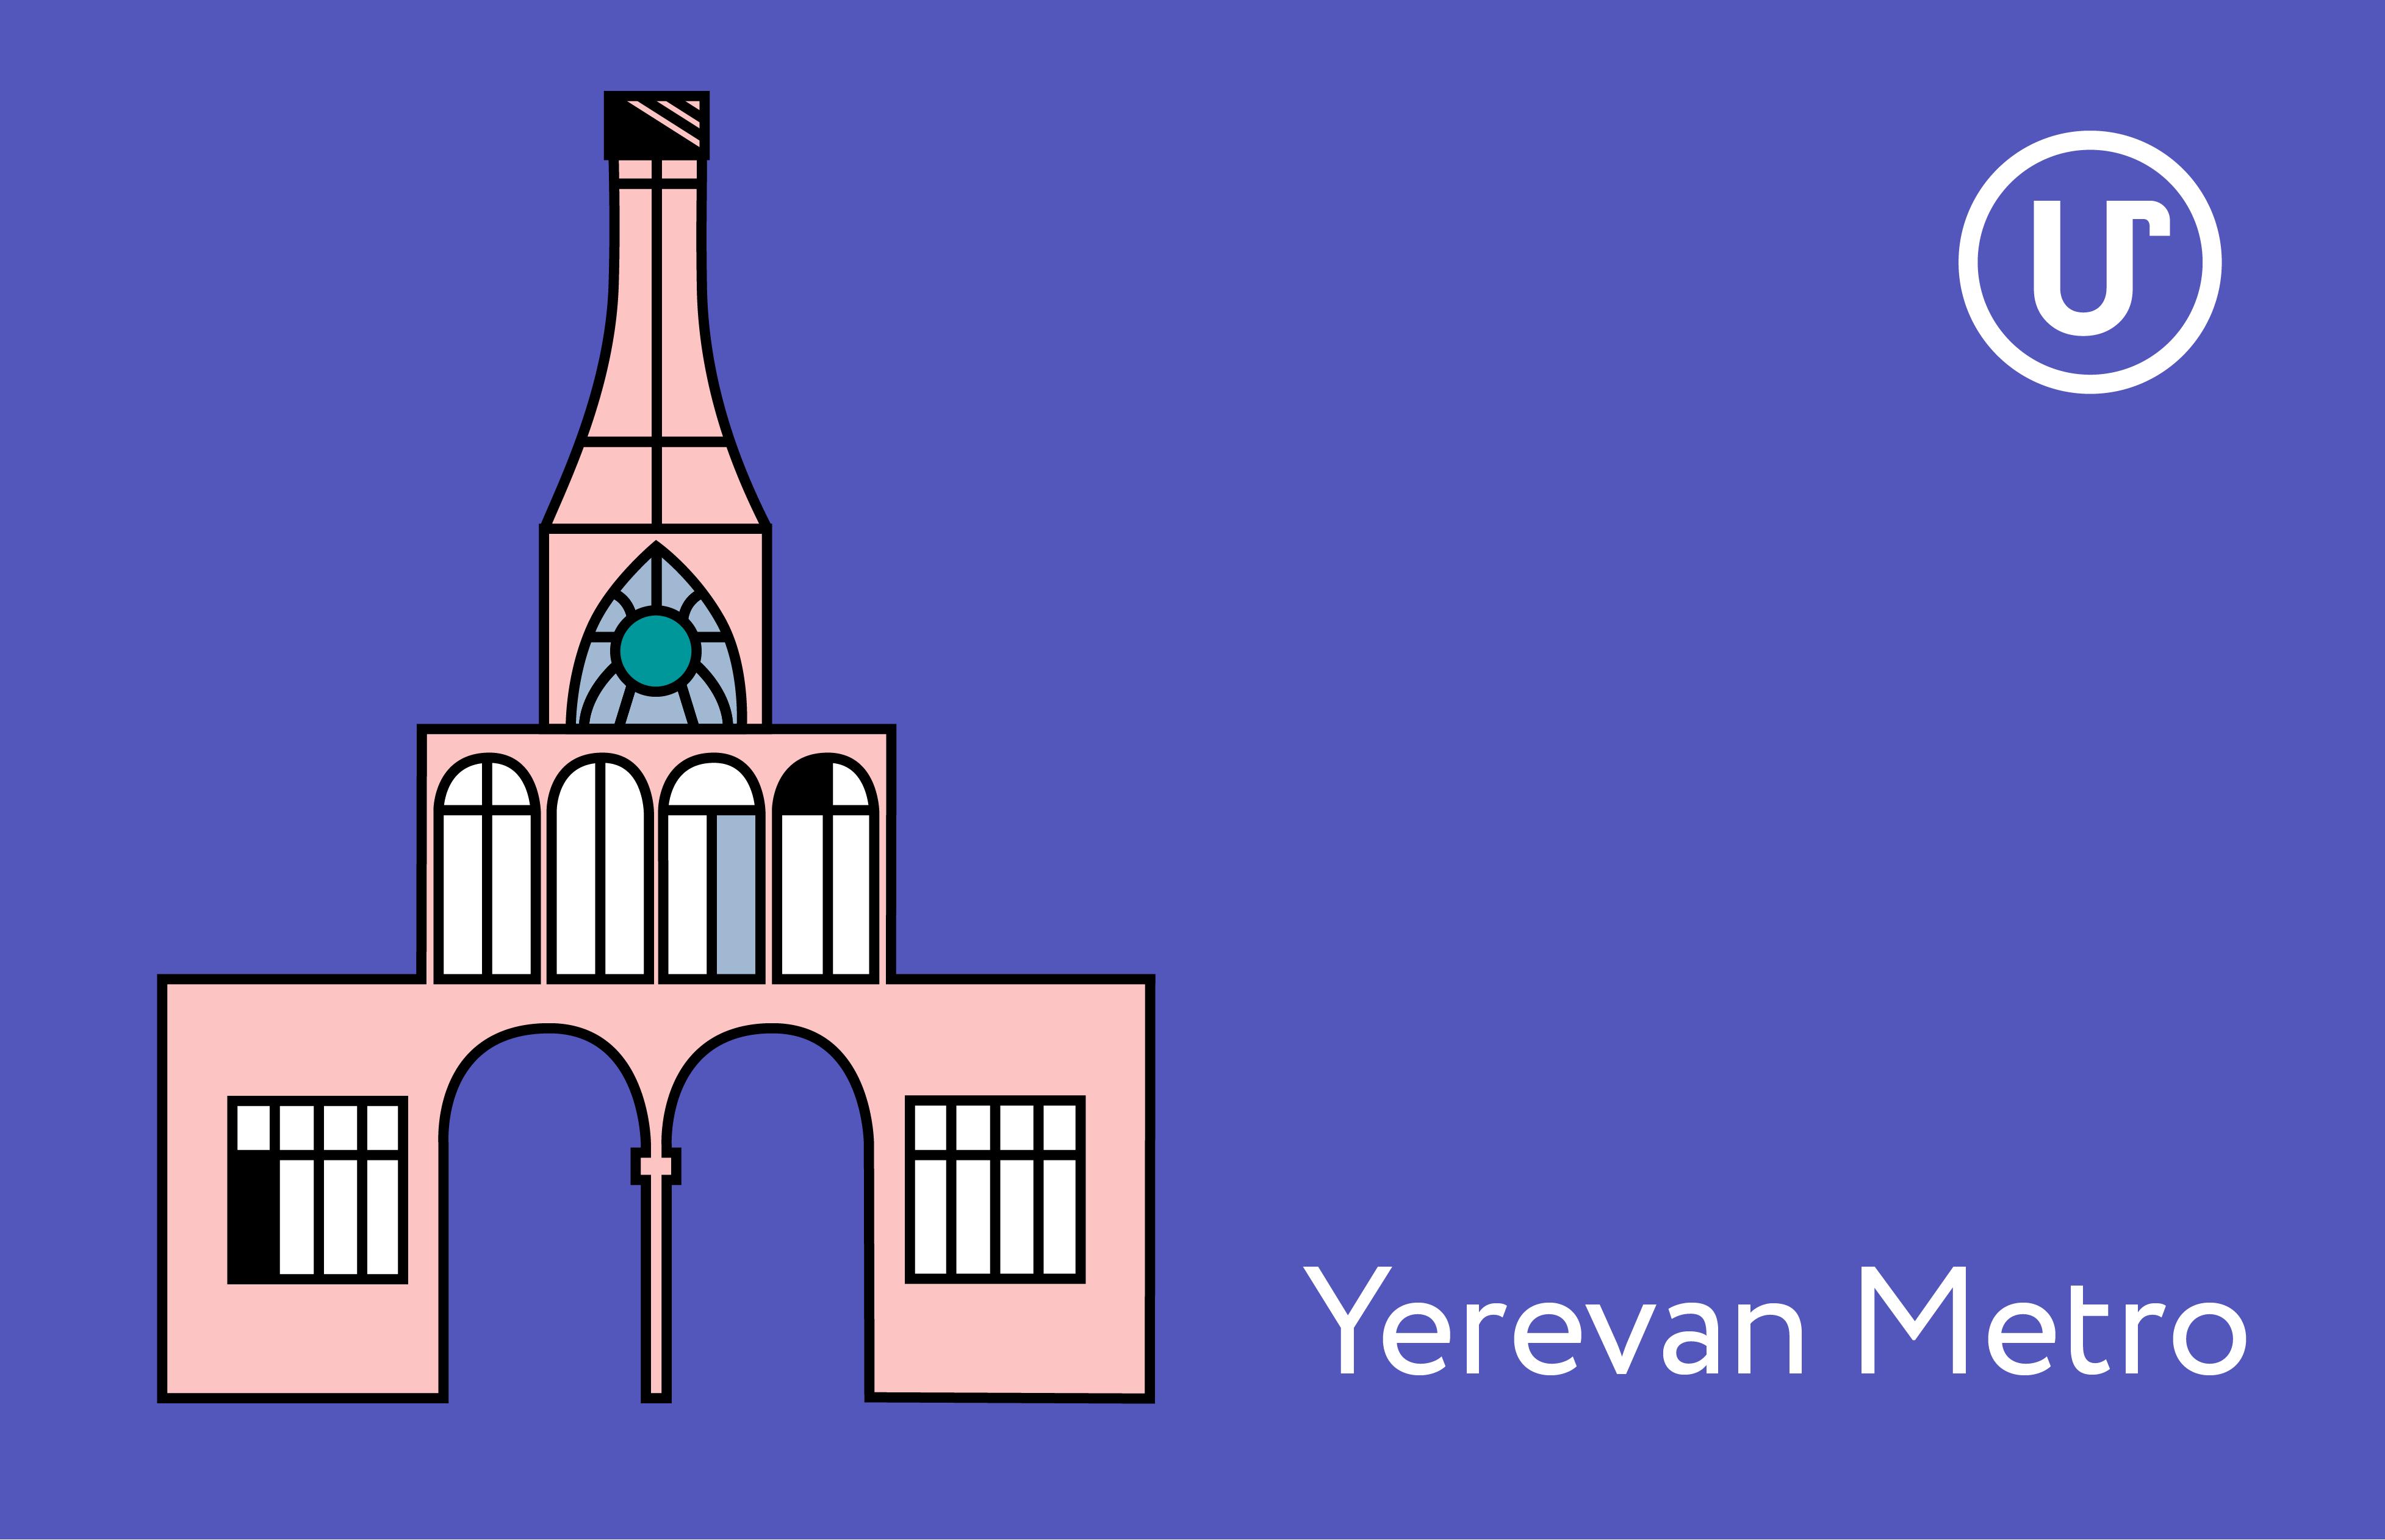 Erevan metro cards.ps Монтажная область 1 копия 3 - Illustrating Metro Passes with Natasha Dzola